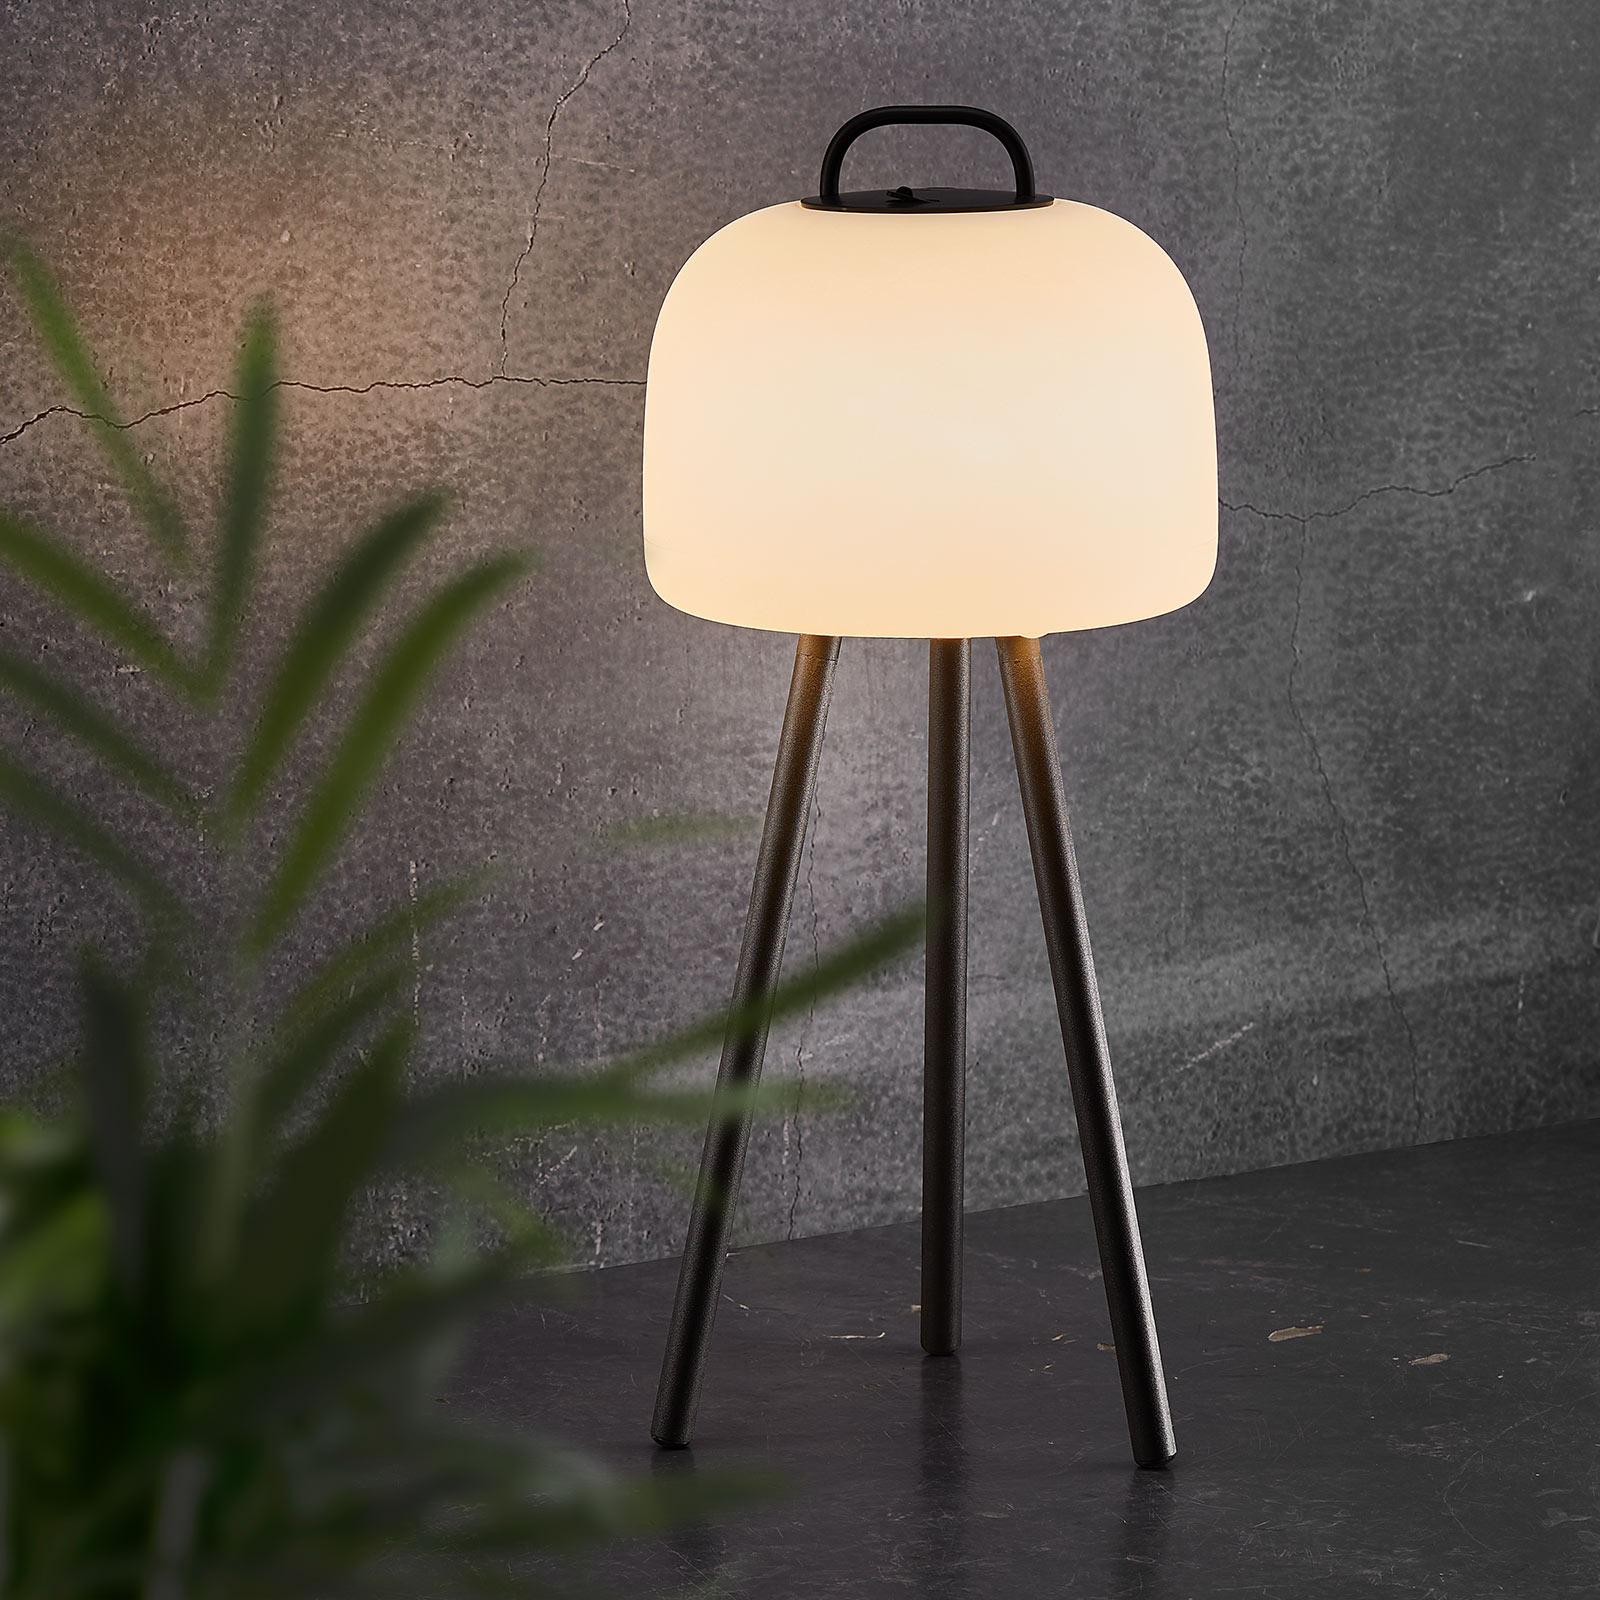 LED-pöytälamppu Kettle Tripod varjostin 22 cm